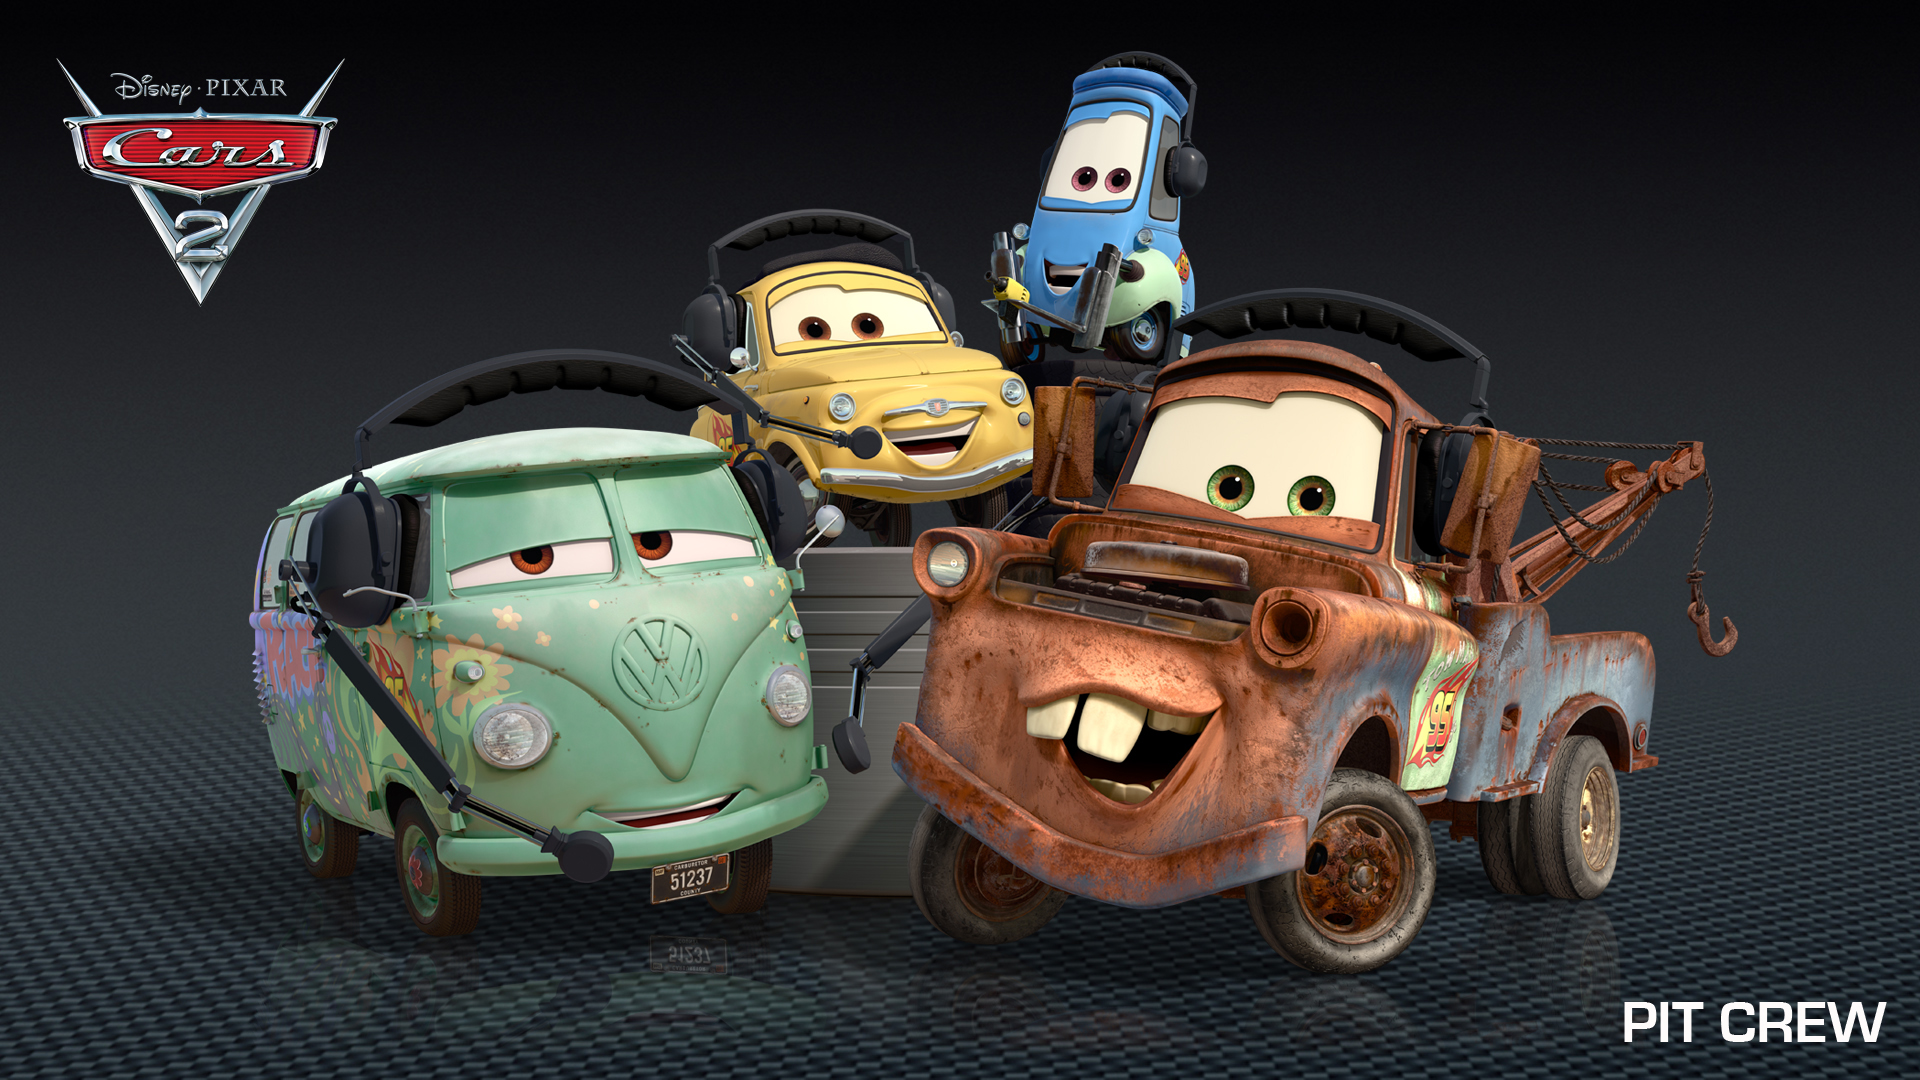 Cars 2 Characters Images & Descriptions